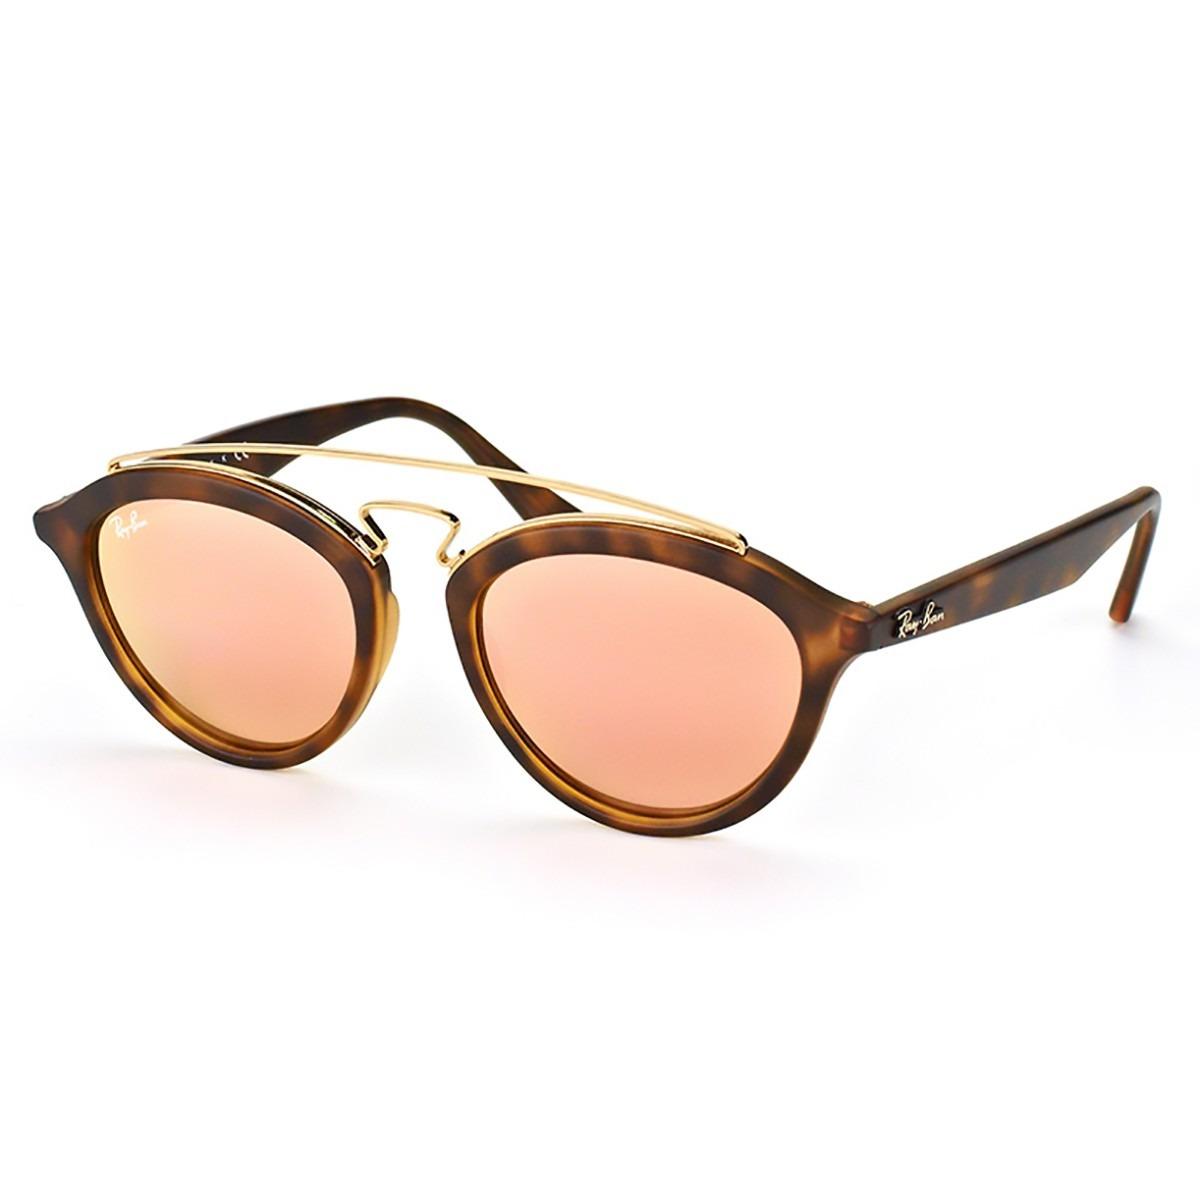 1805eca94 Óculos De Sol Ray Ban Gatsby Oval Rb4257 - R$ 488,00 em Mercado Livre